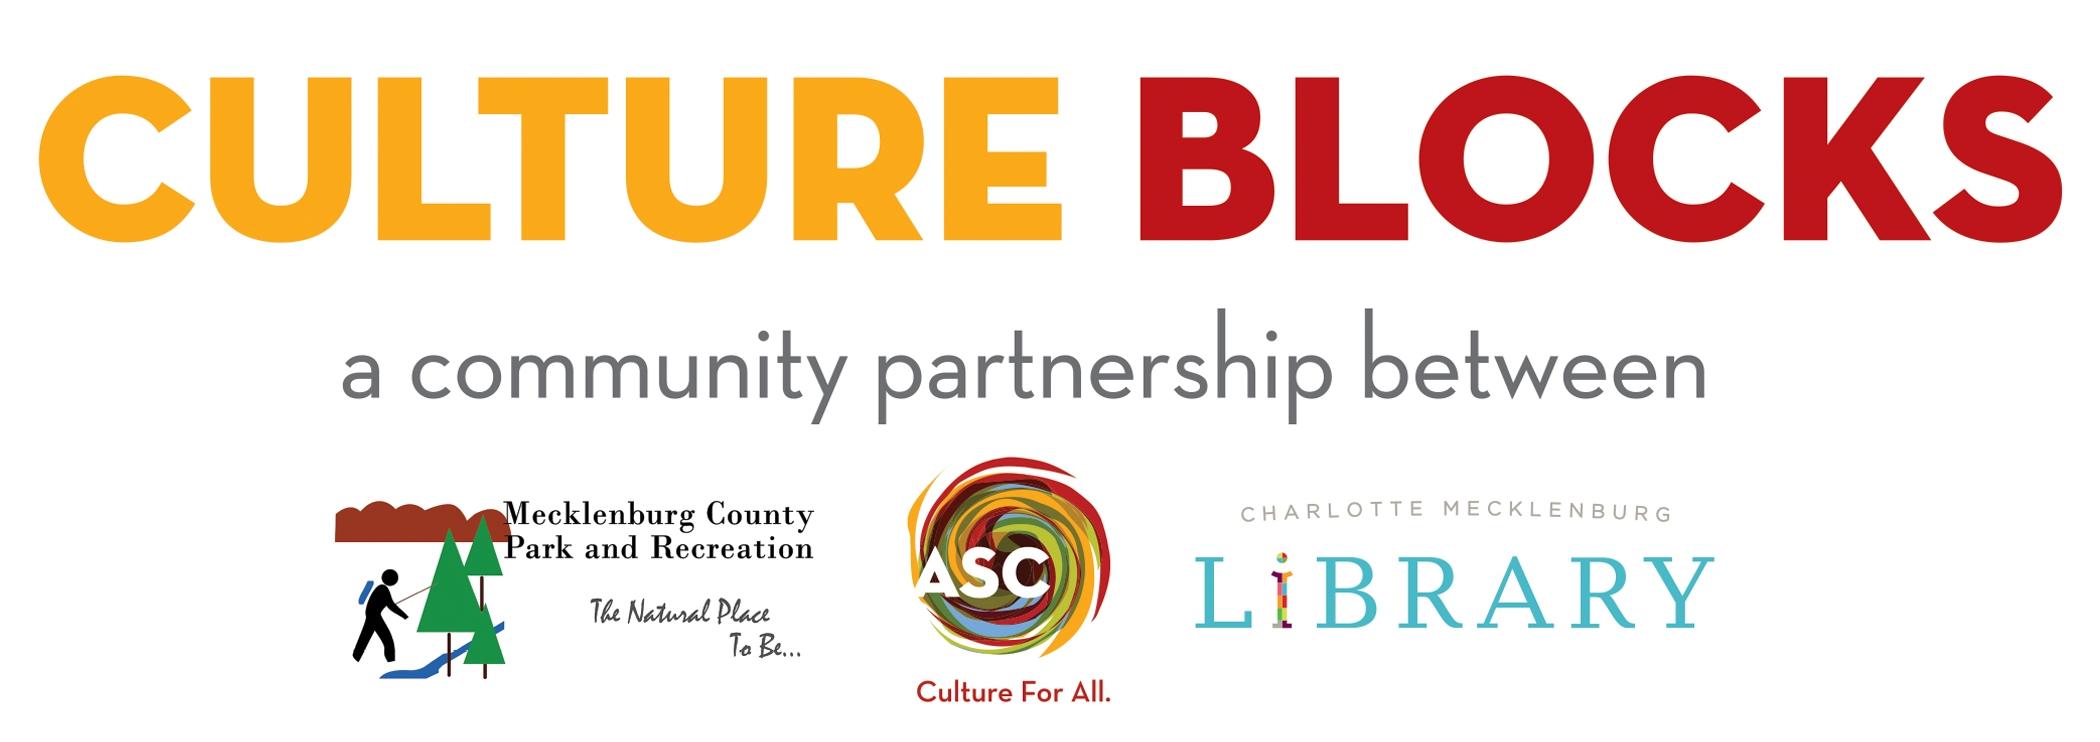 Culture Blocks logo with sponsors.jpg